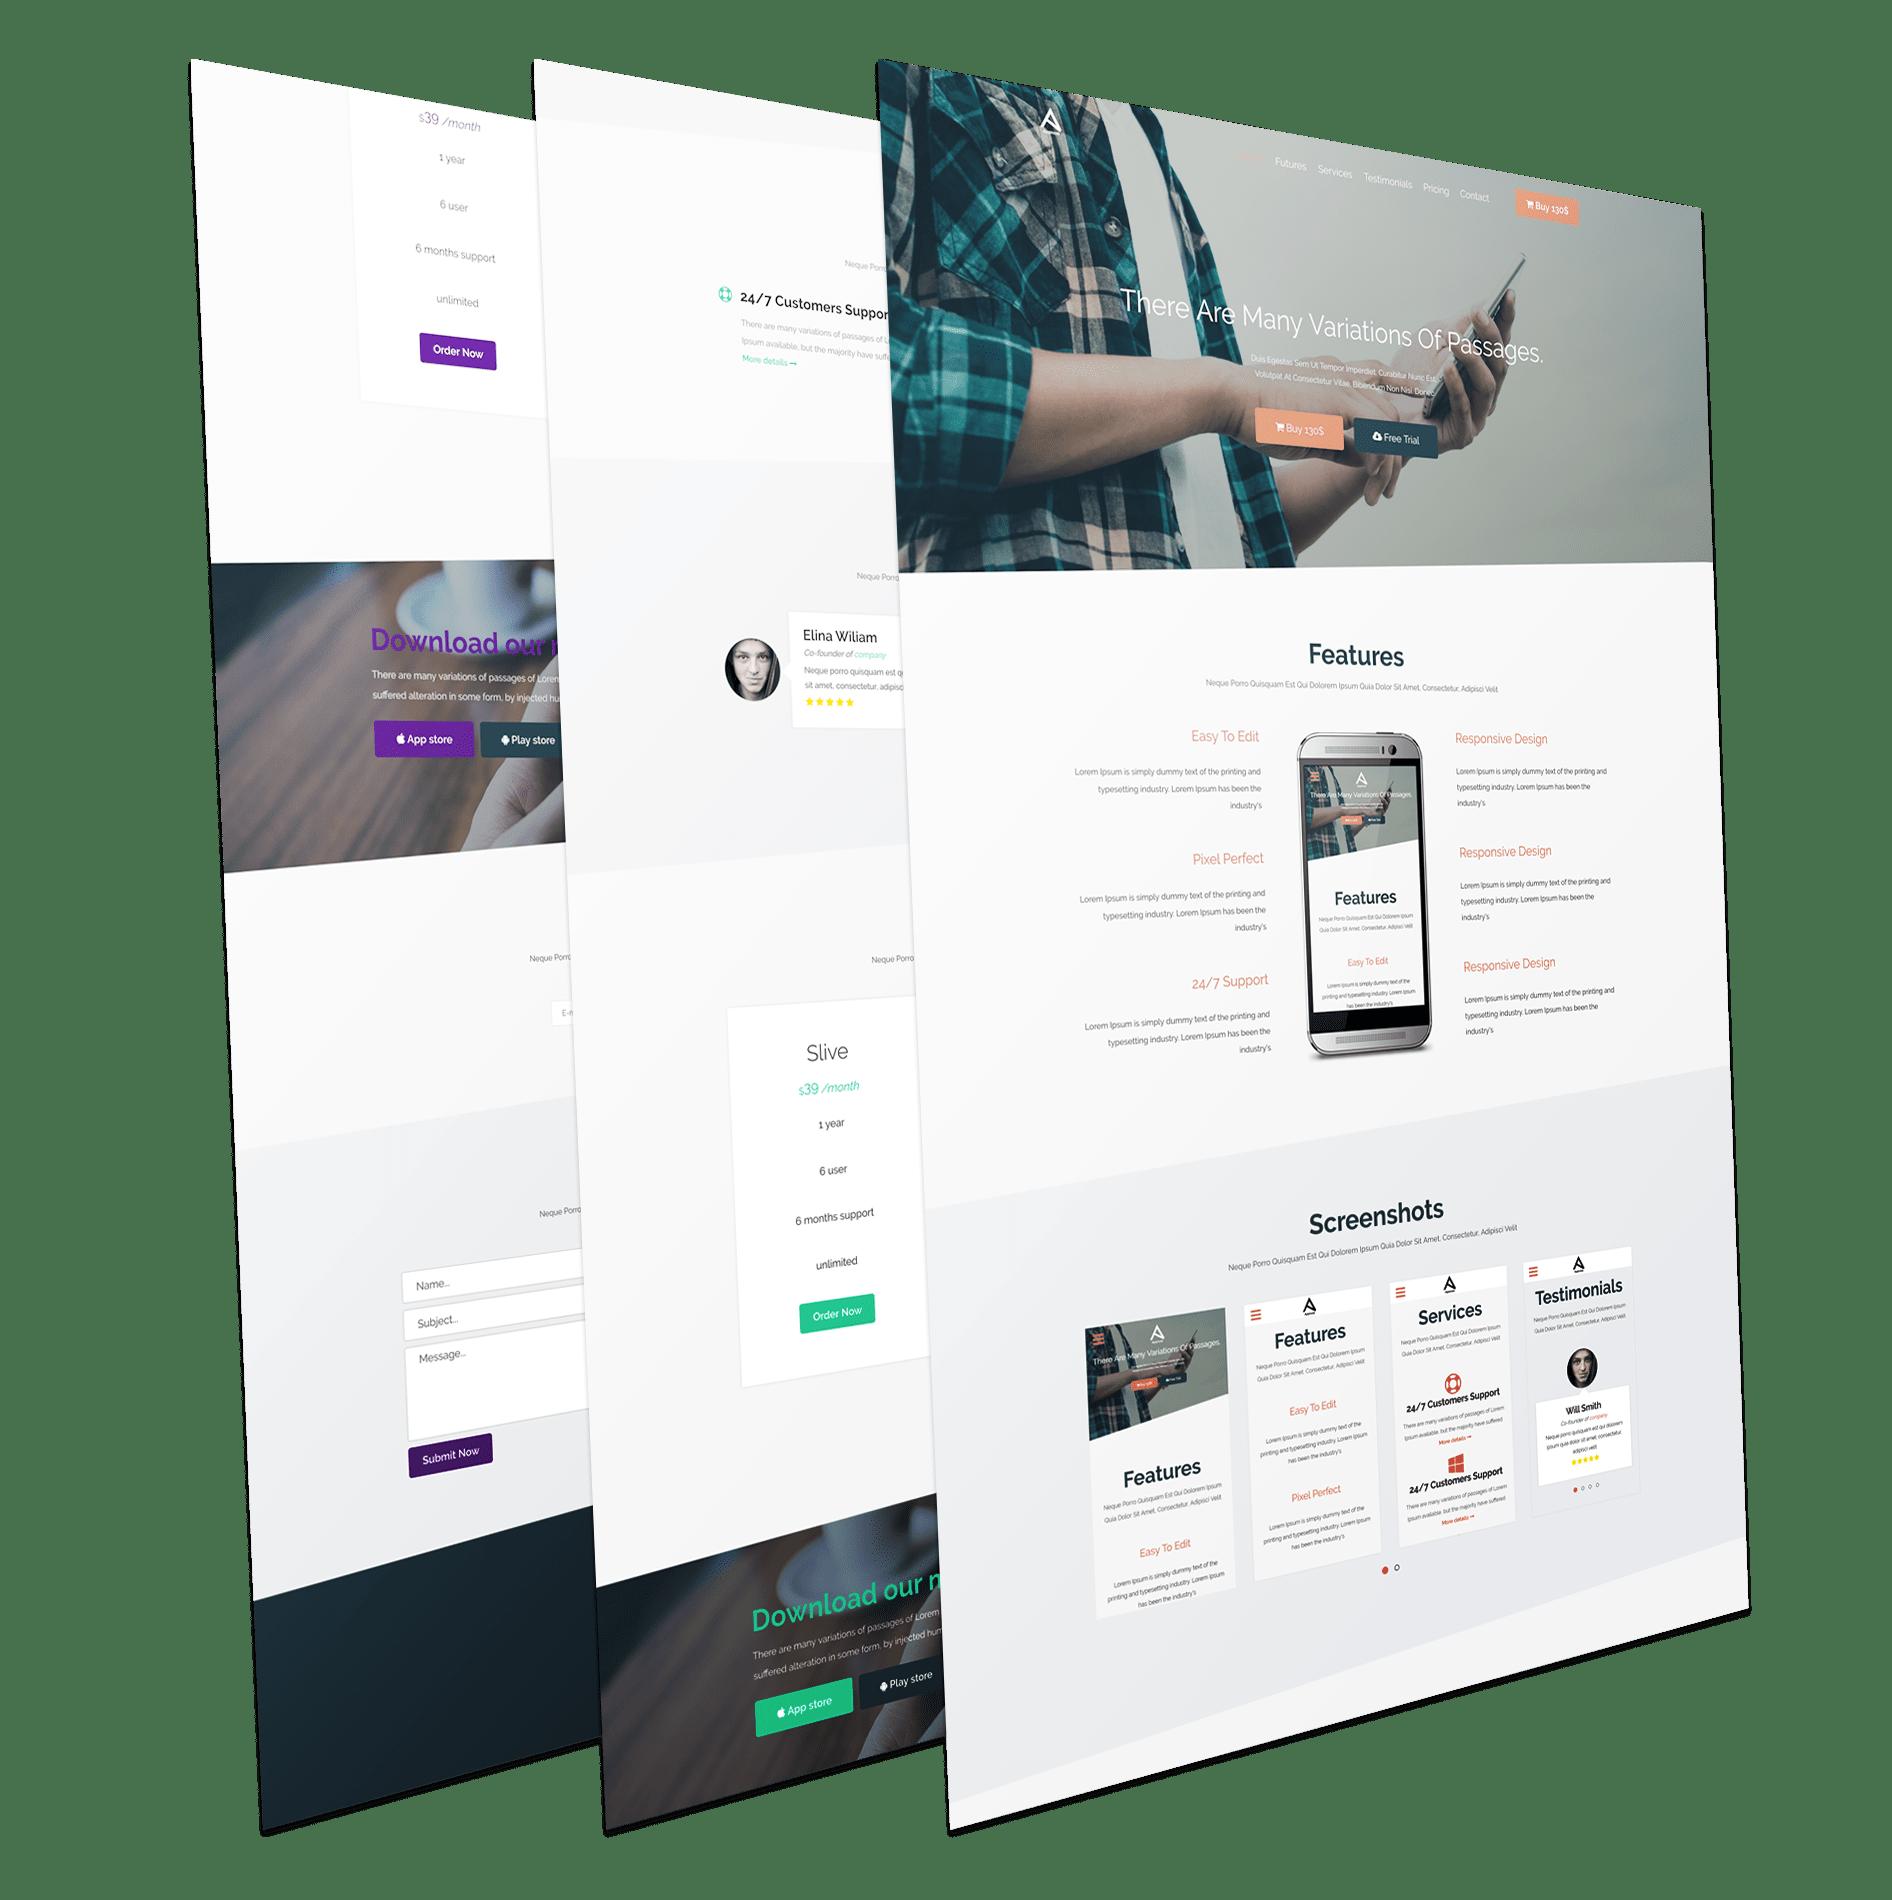 Appnow Creative Joomla Landing Page Template - Joomla landing page template